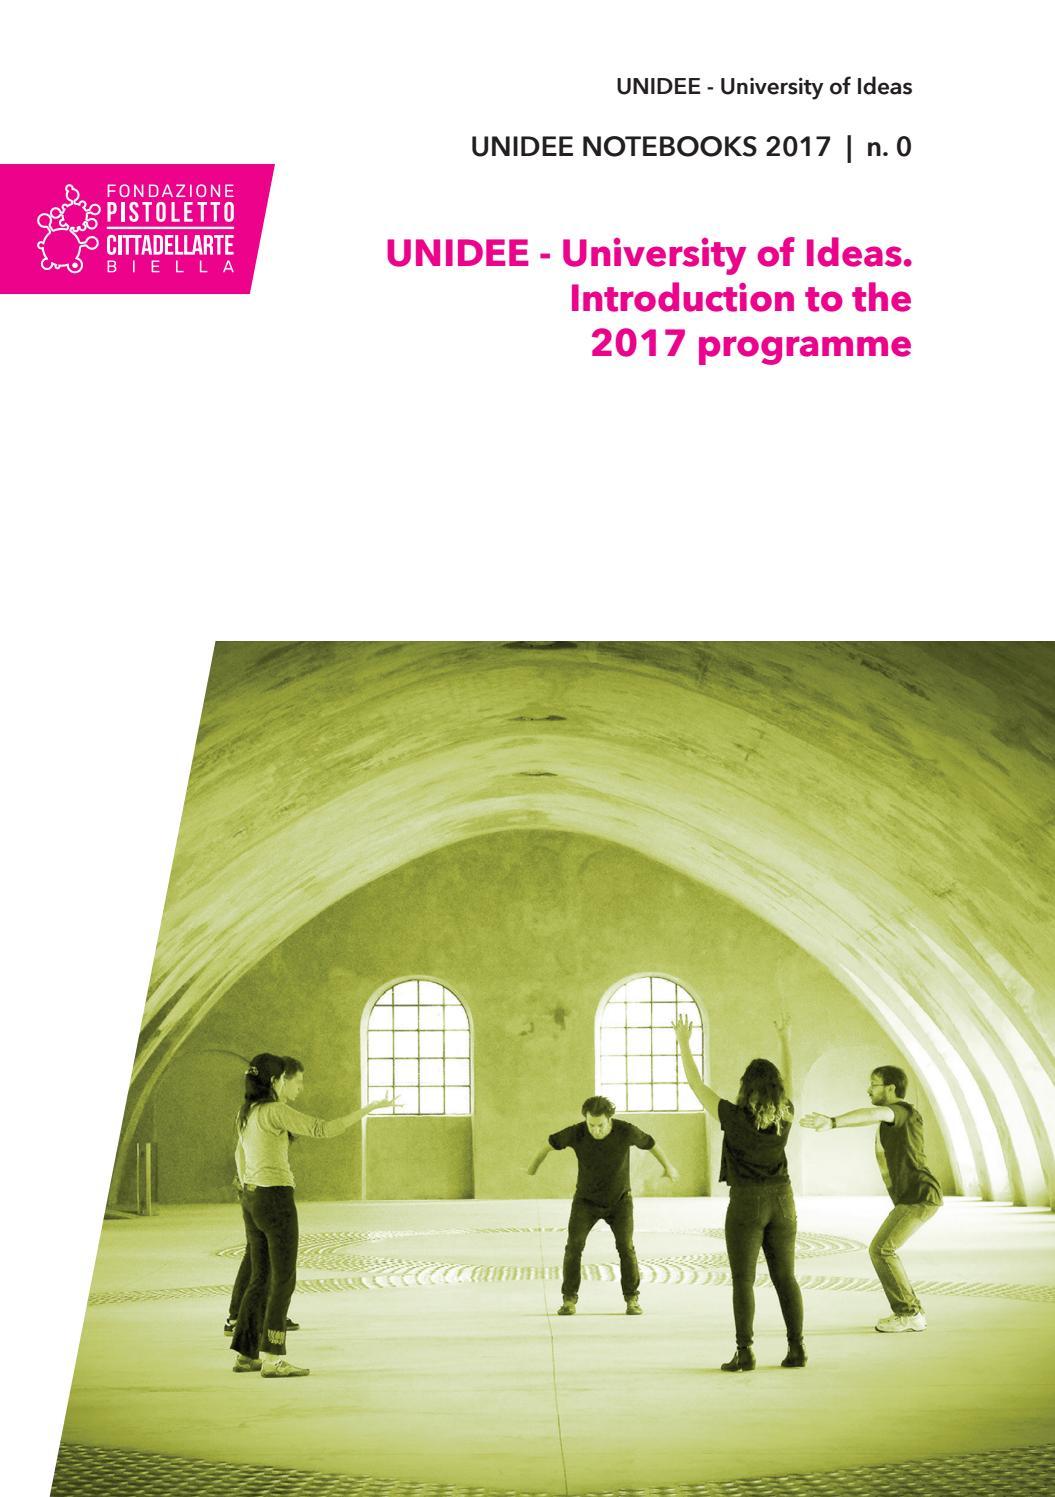 Unidee Notebooks 2017 N 0 By Cittadellarte Fondazione